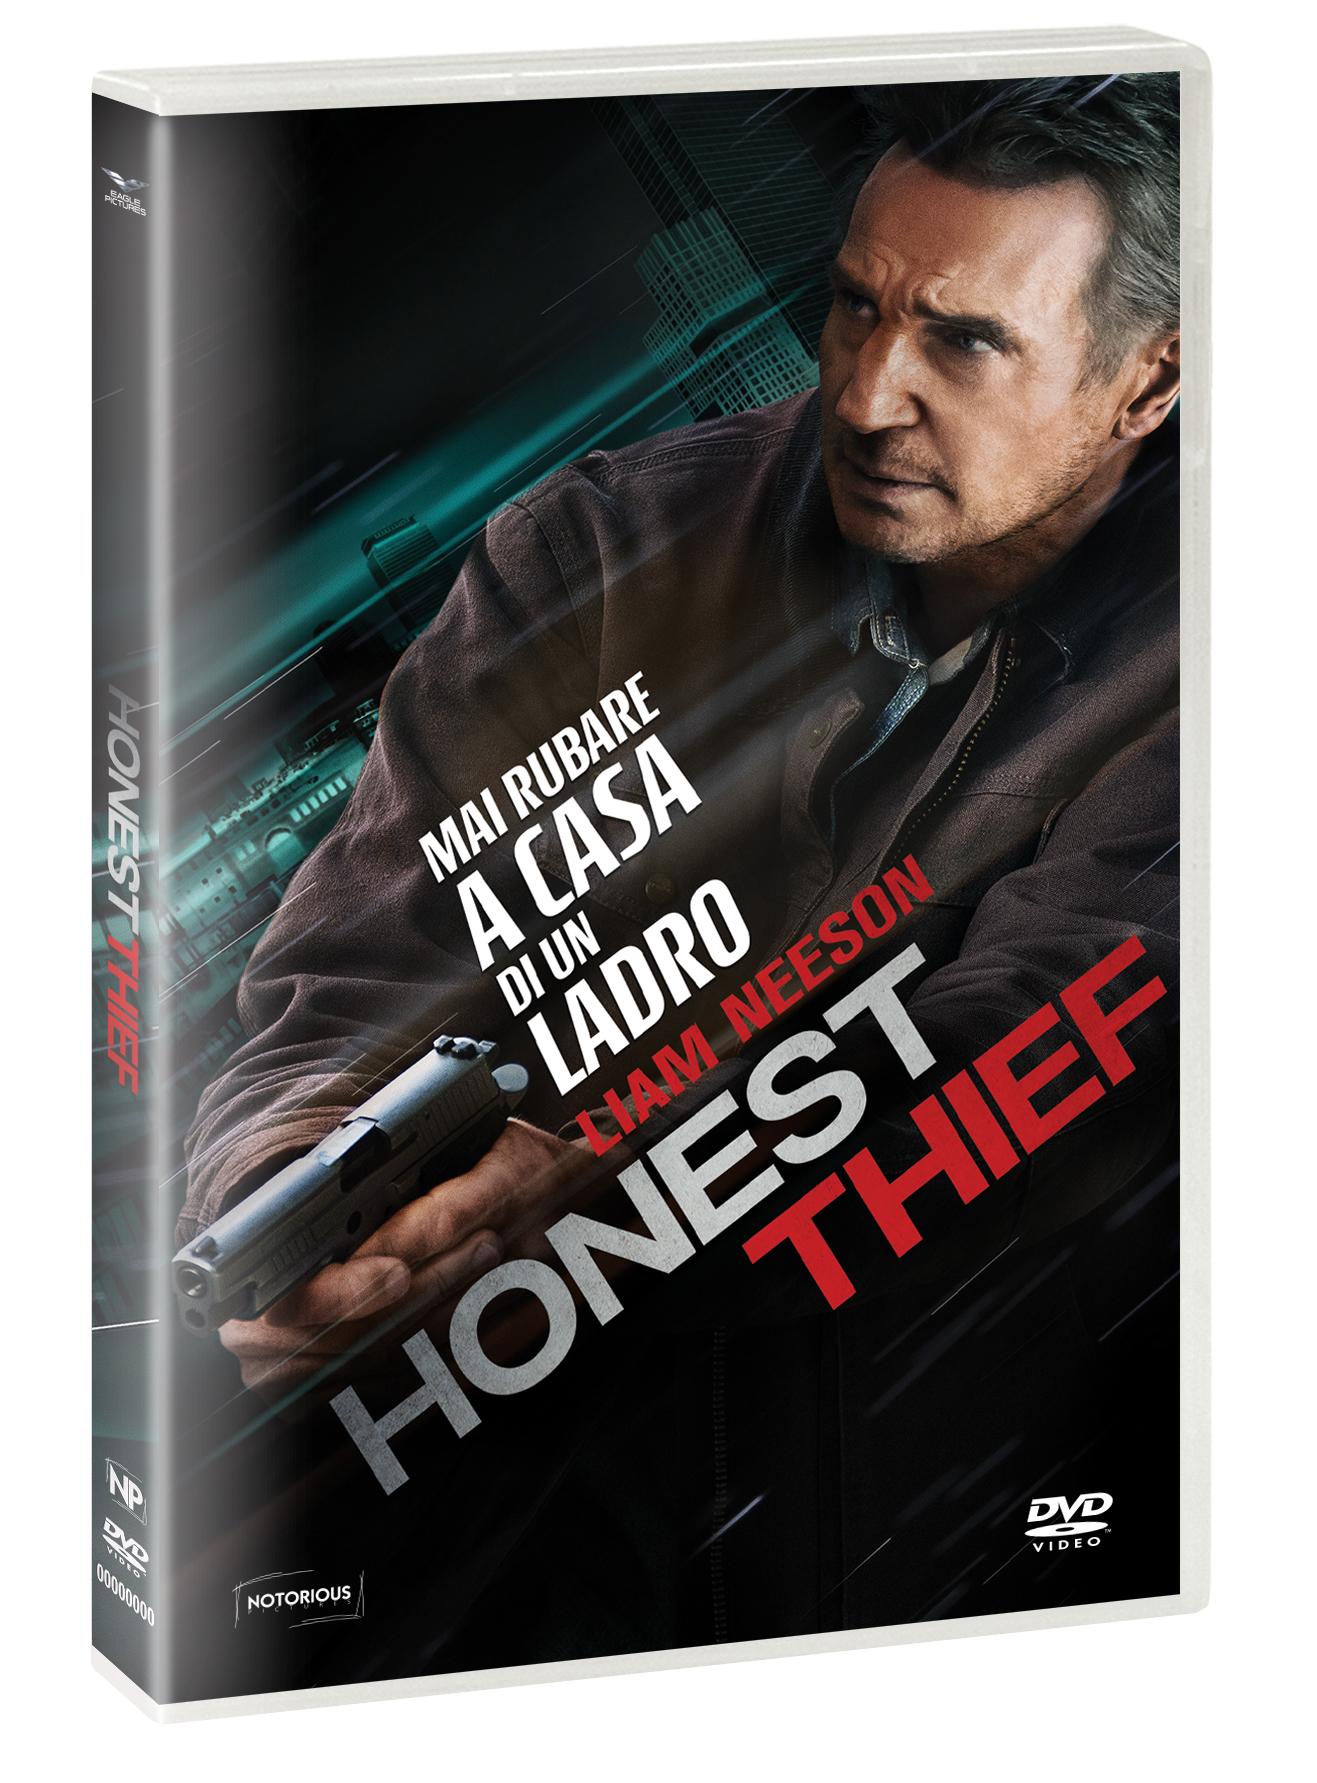 HONEST THIEF (DVD)